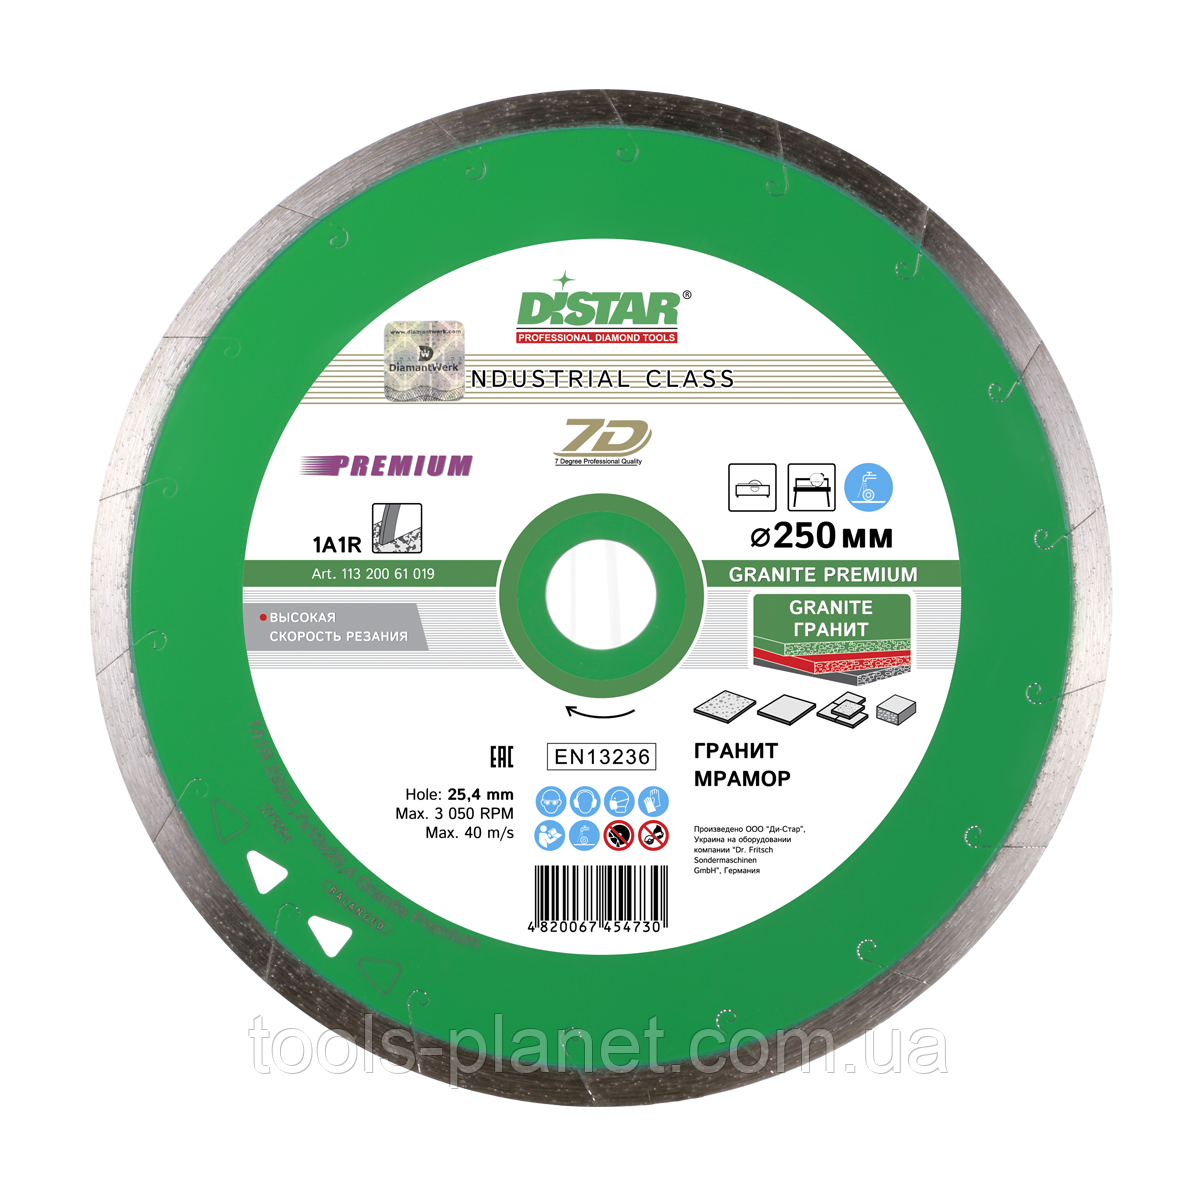 Алмазный диск Distar 1A1R 250 x 1,7 x 10 x 25,4 Granite Premium 7D (11320061019)